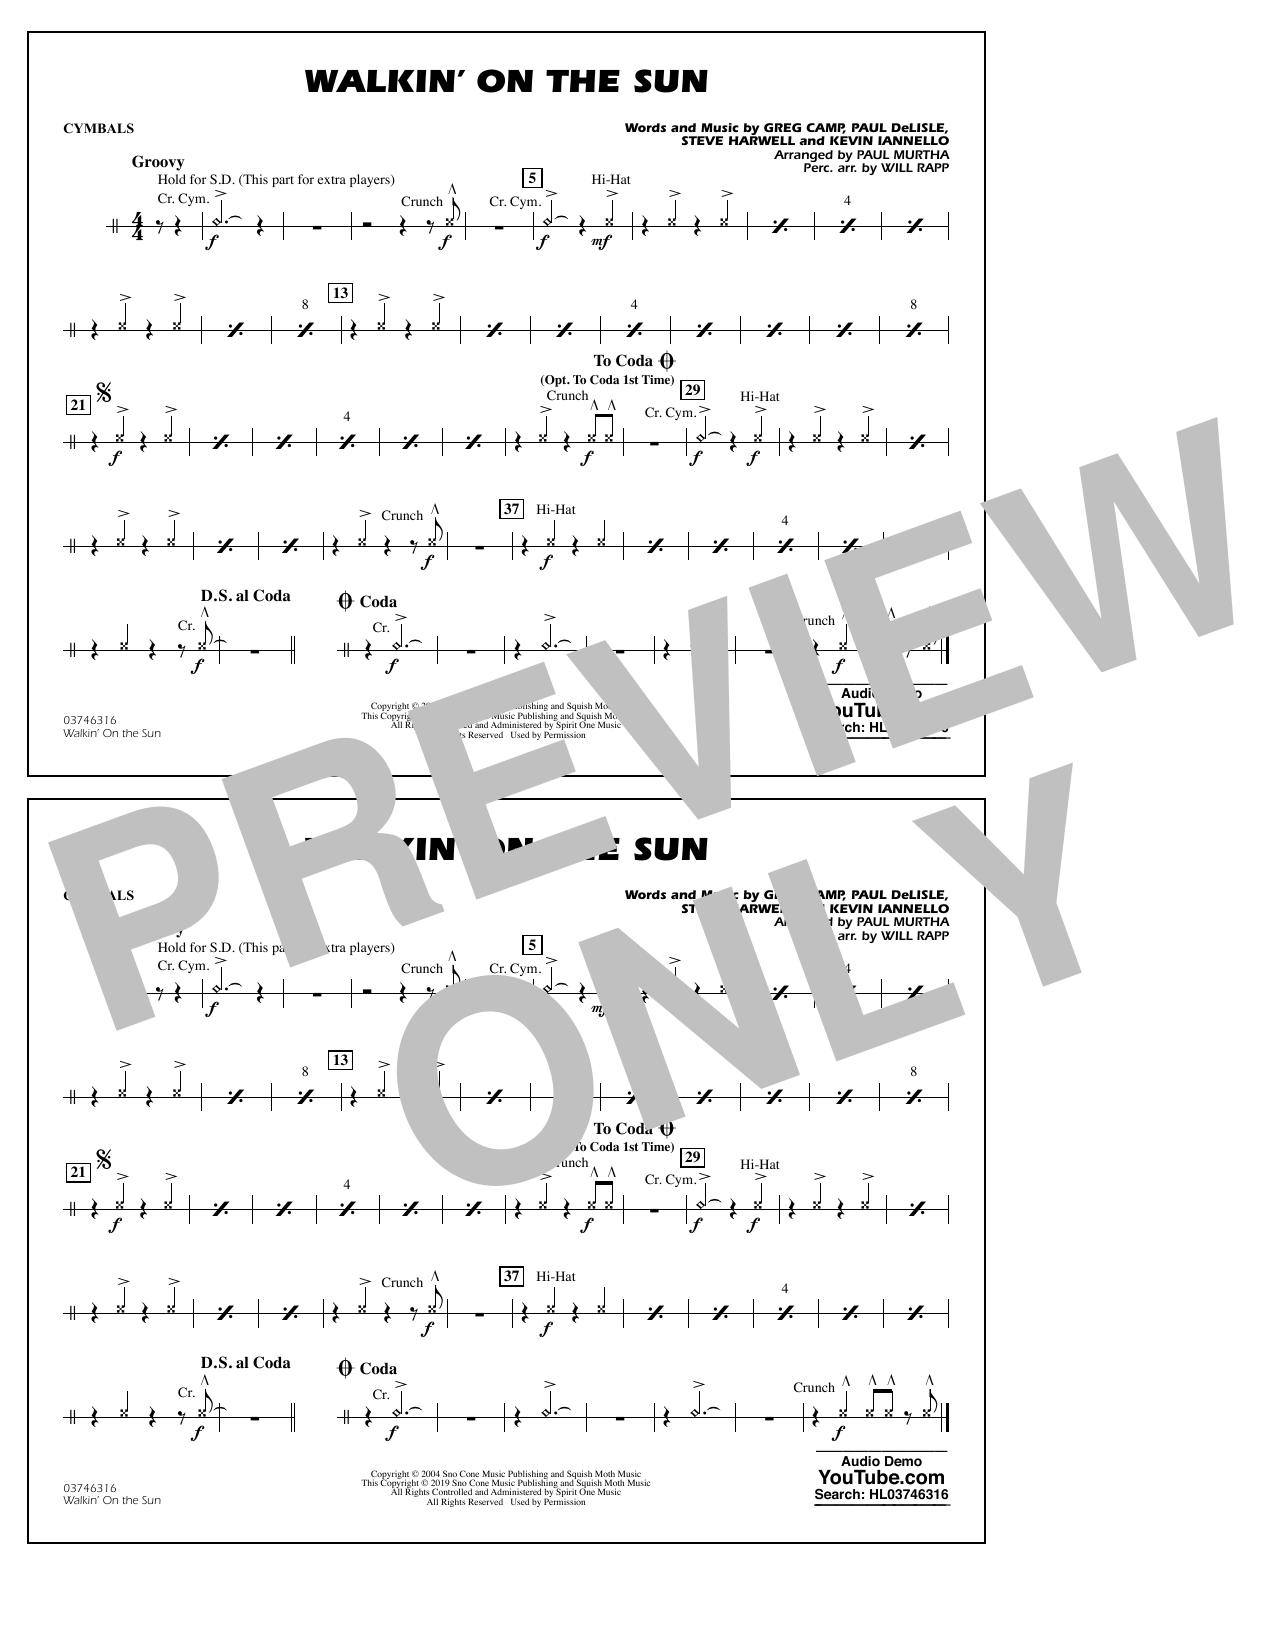 Walkin' on the Sun (arr. Paul Murtha) - Cymbals (Marching Band)